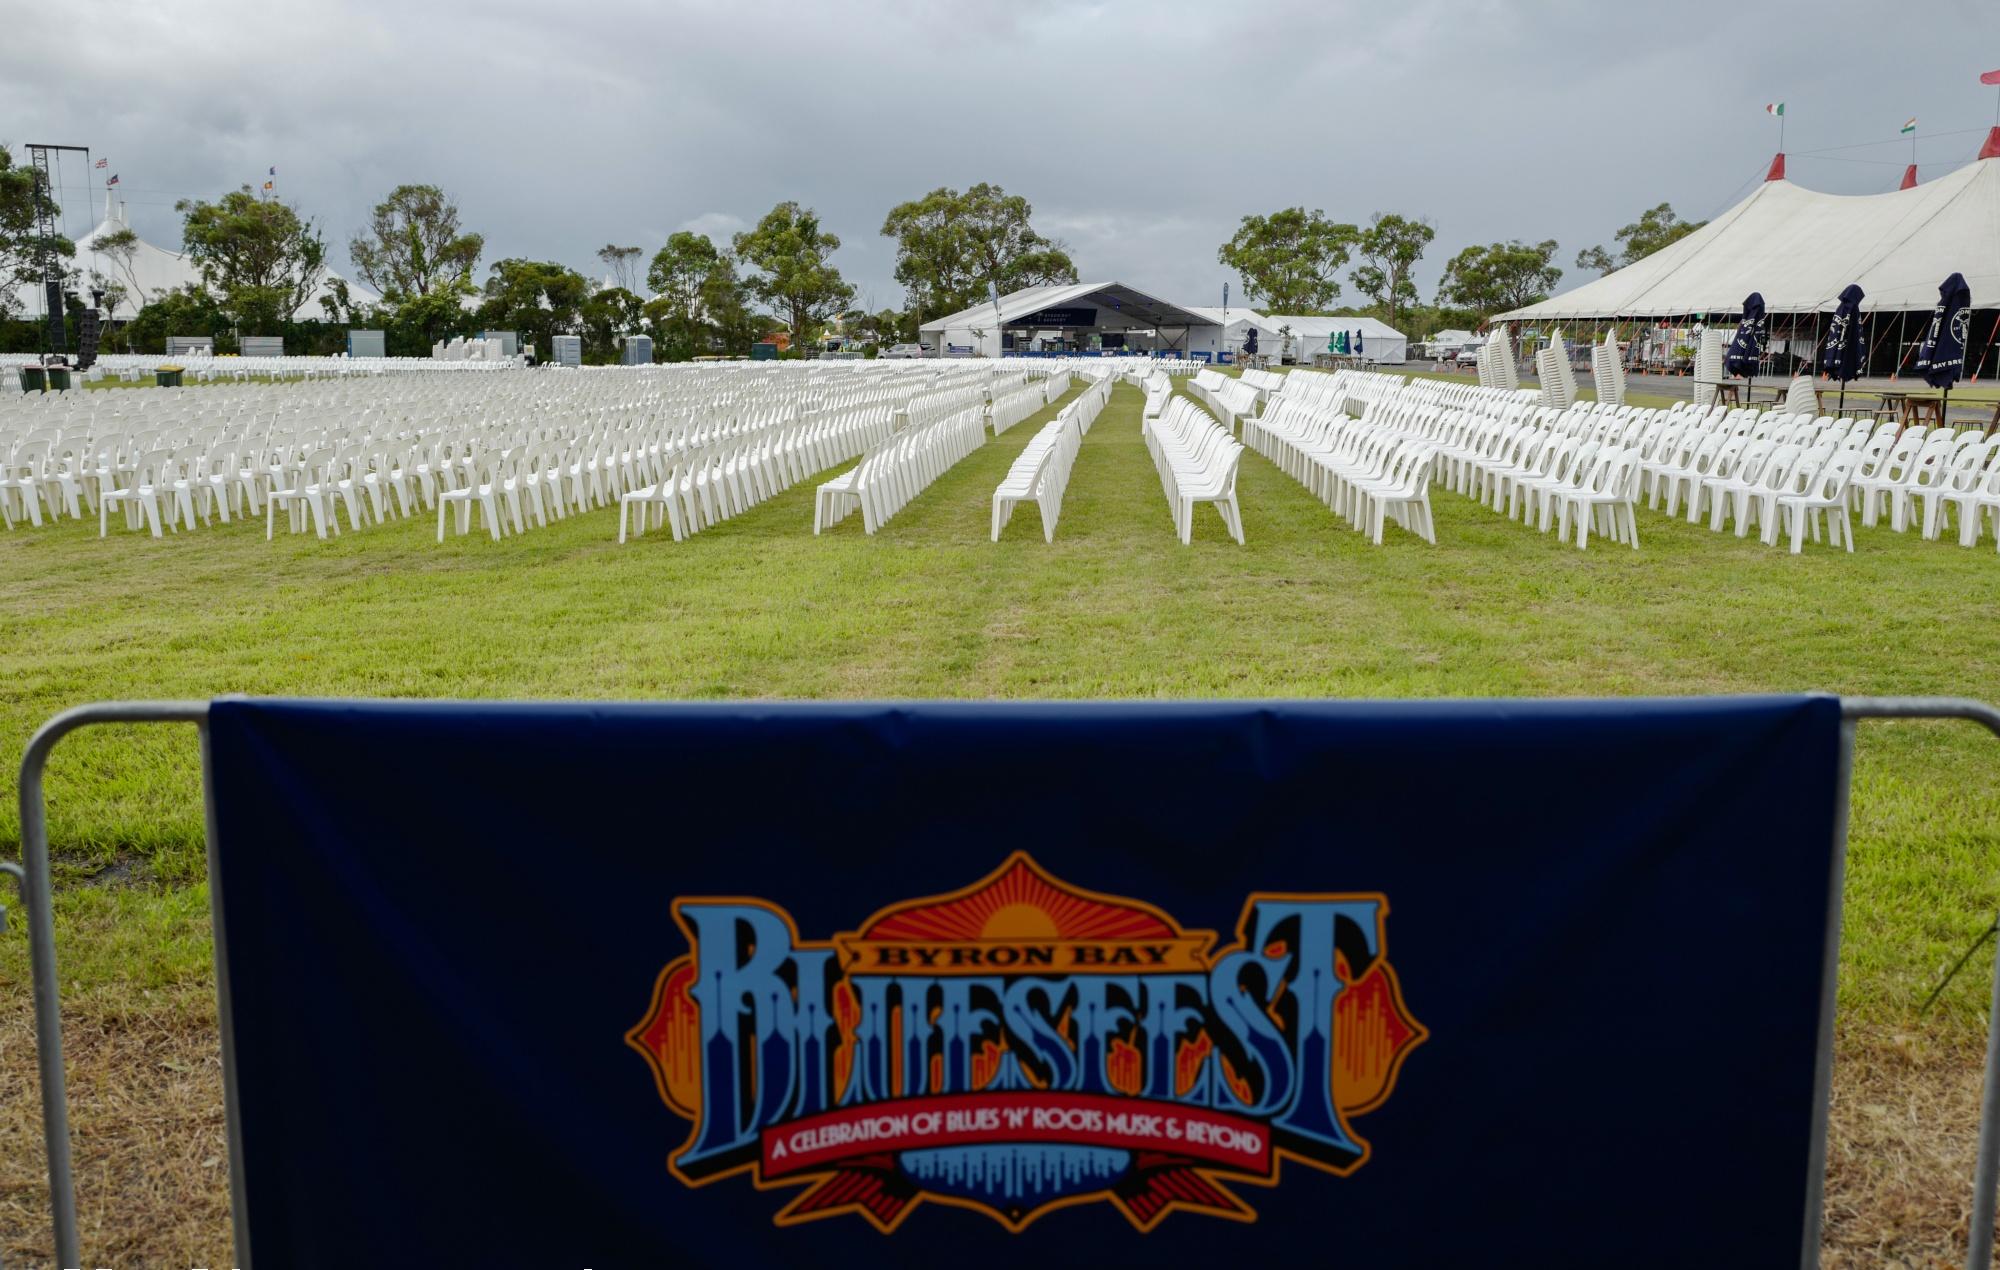 bluesfest cancellation 2021 cost $10million live performance australia